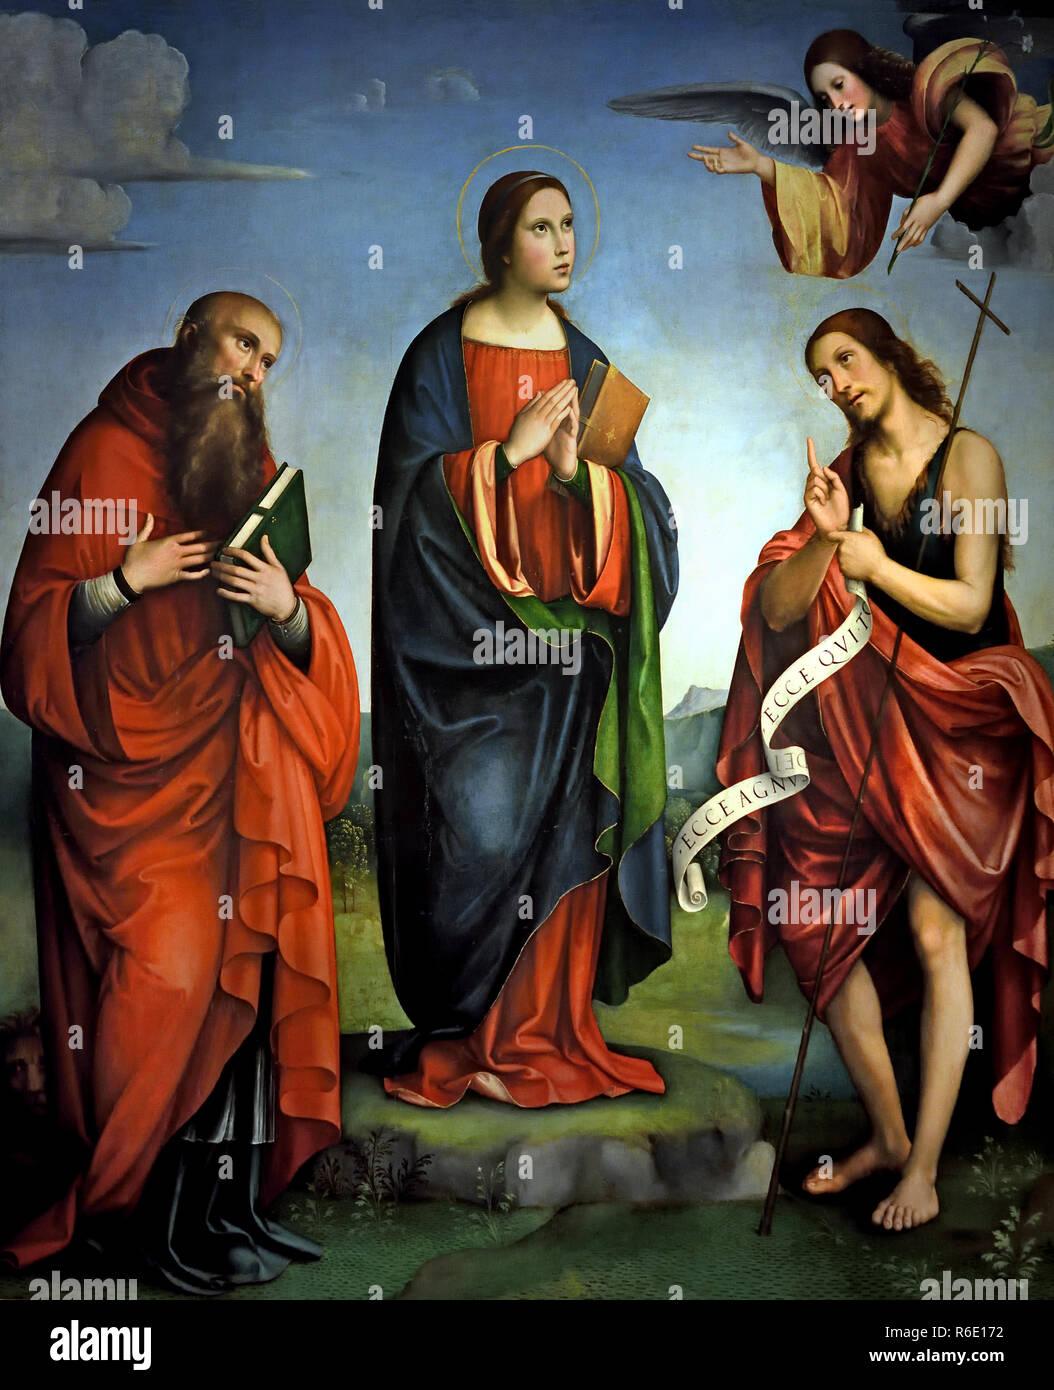 Virgin announced among the Saints John the Evangelist, Francis, Bernardino and Giorgio by Raibolini Francesco ( said France ) 1447 -1517 15-16th century, Italy, Italian. - Stock Image